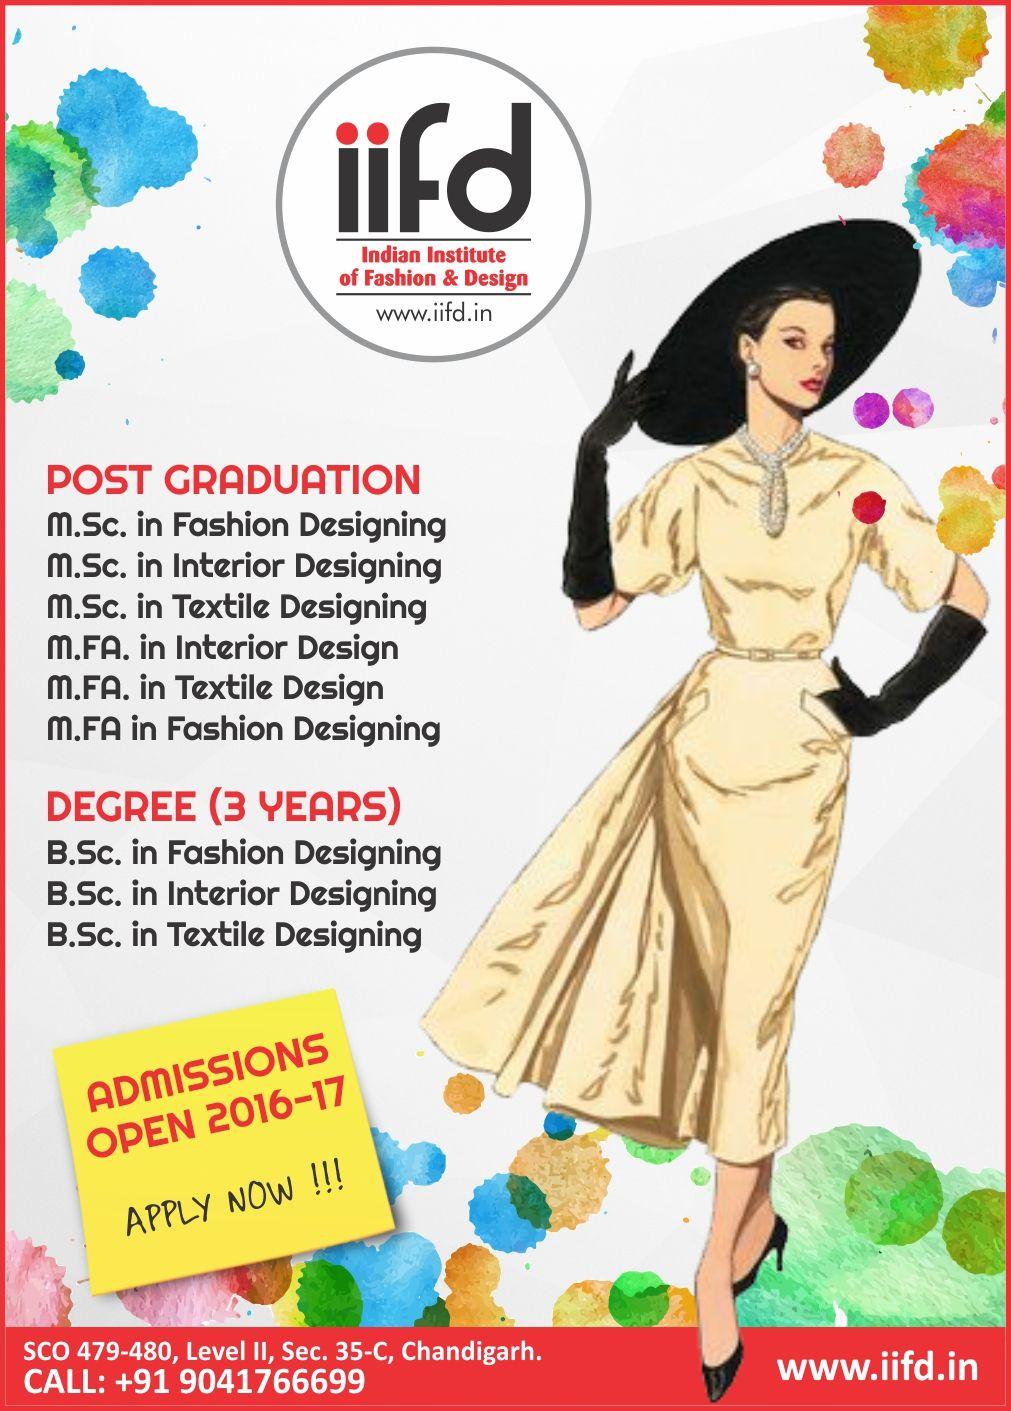 Indian Institute Of Fashion Design Best Fashion Designing Institute In Chandigarh Ad Fashion Designing Course Fashion Designing Institute Technology Fashion